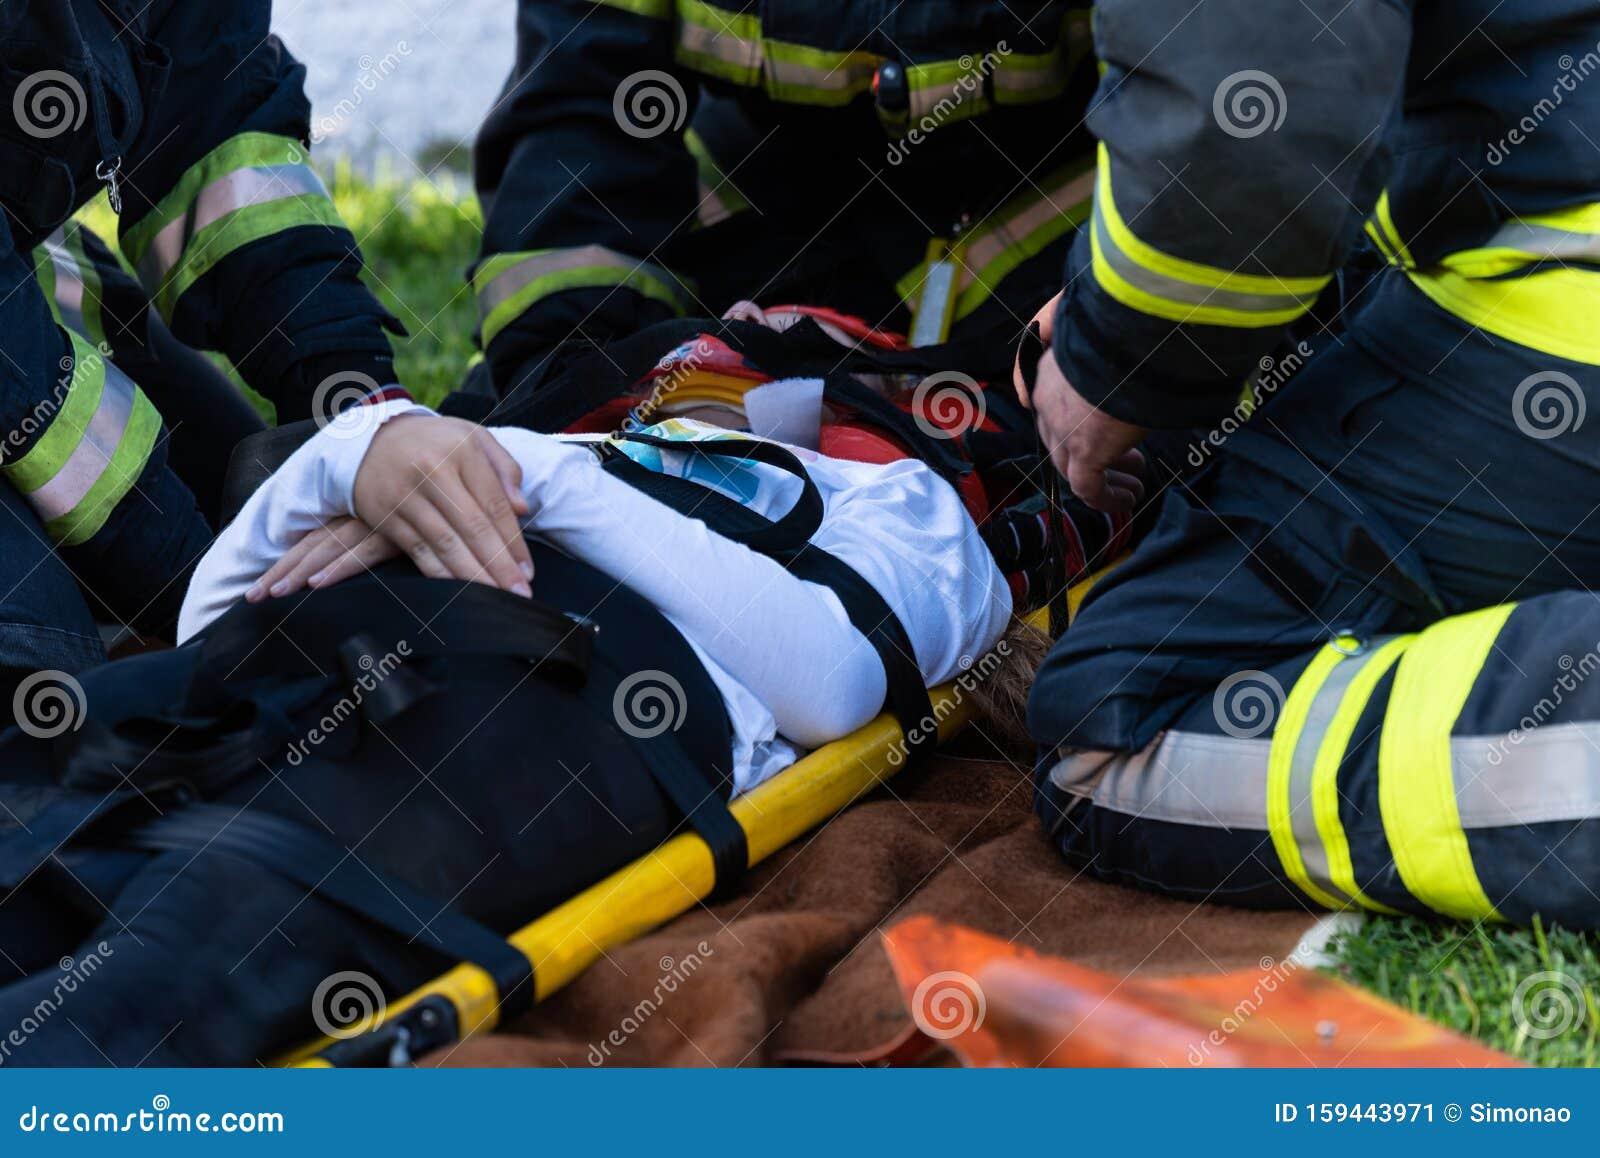 Victim on stretcher stock photo. Image of paramedic